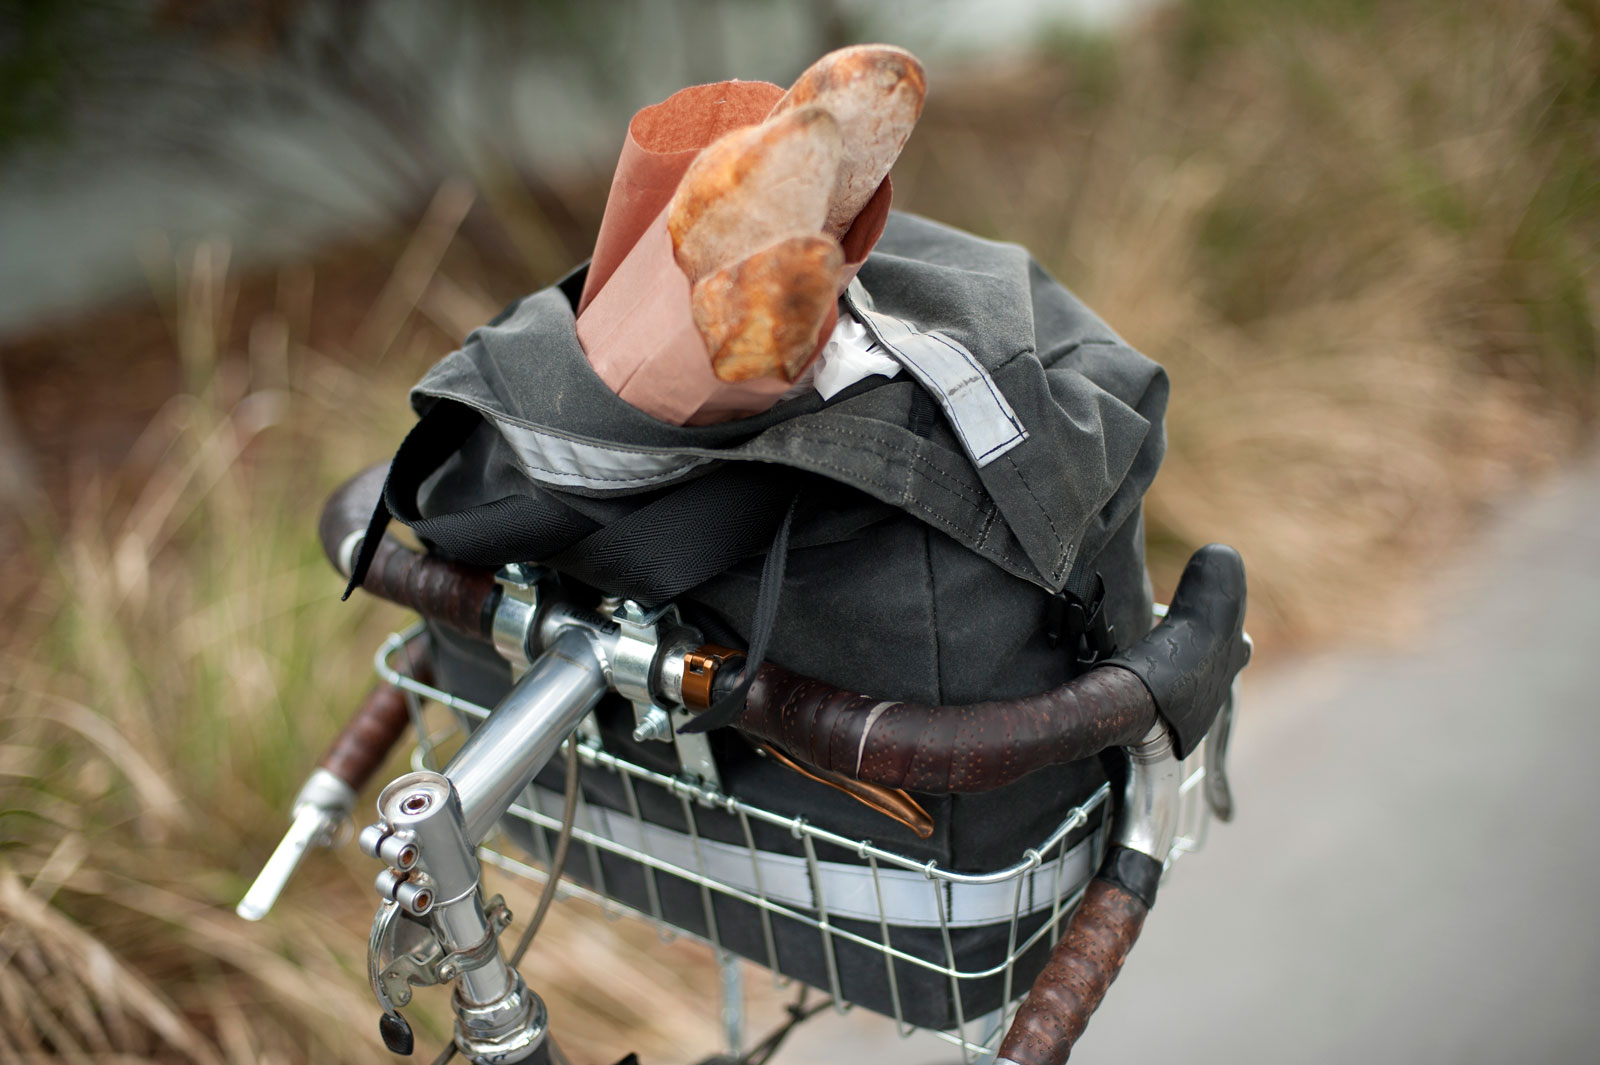 Tearra-Rosa-custom-bag-for-wald-basket-1.jpg